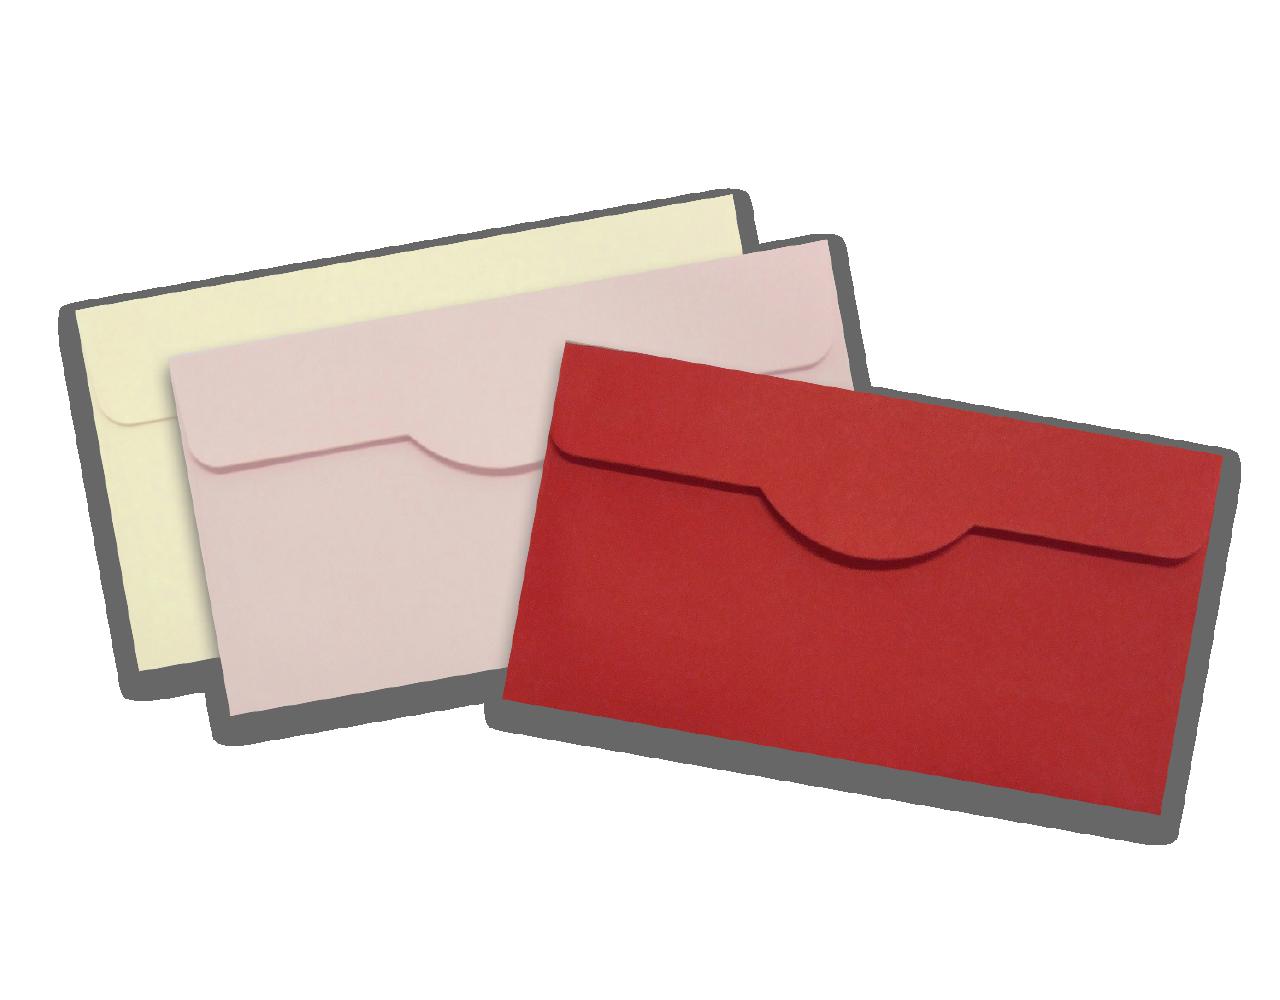 Envelope 11.4 x 20.5 cm. 100 g ฿ 2.50